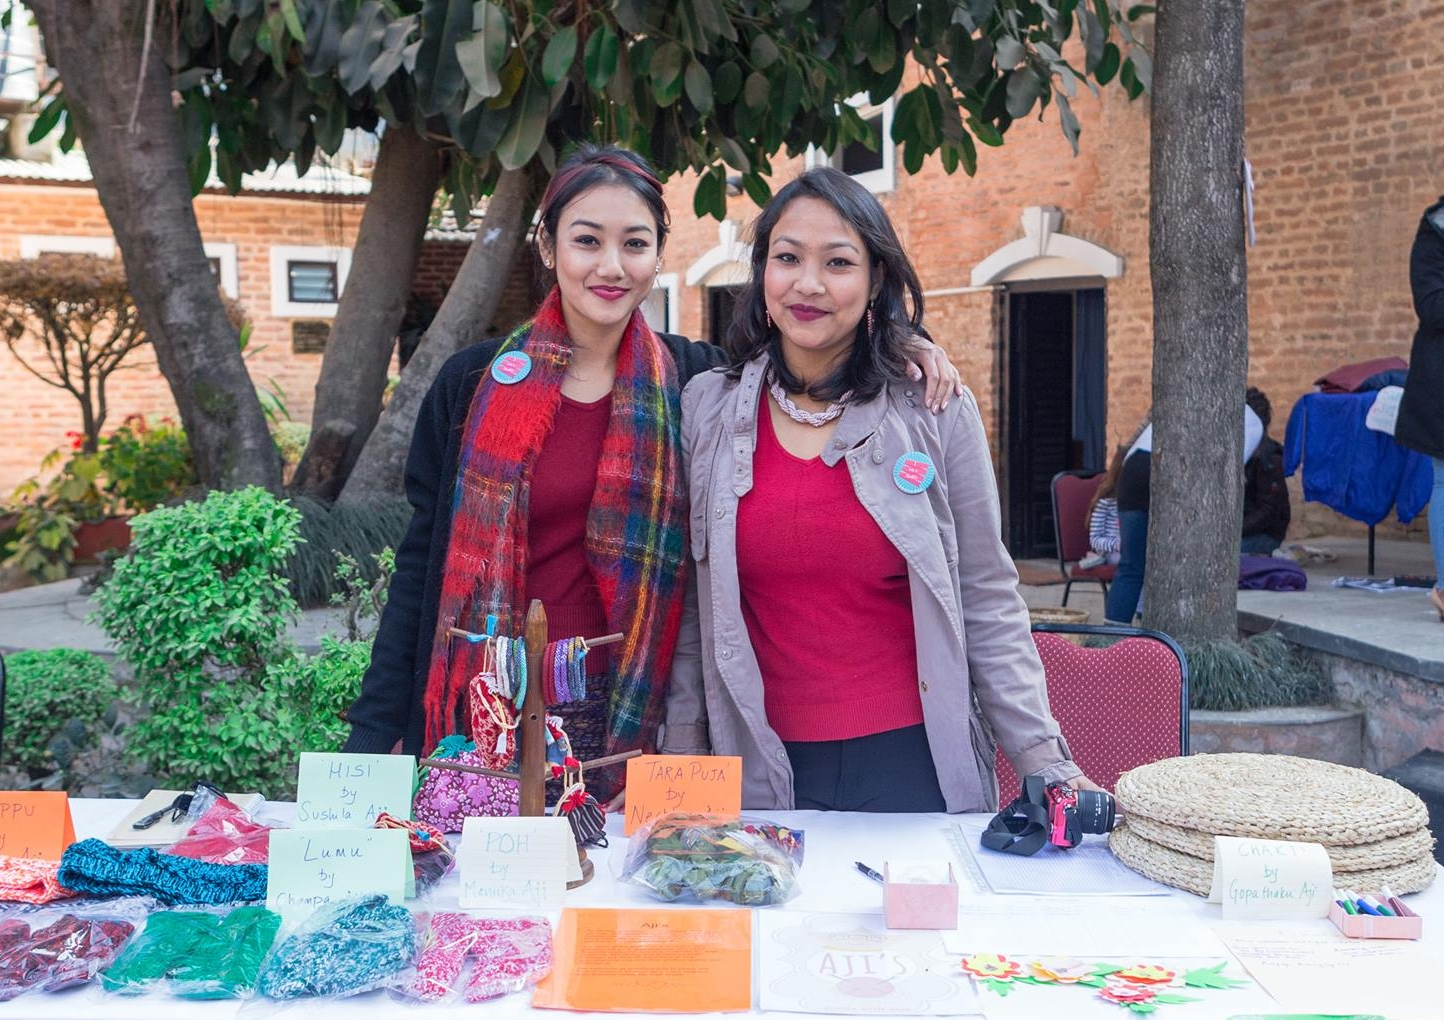 Lorina & Irina at Aji's first maker faire in early 2018.